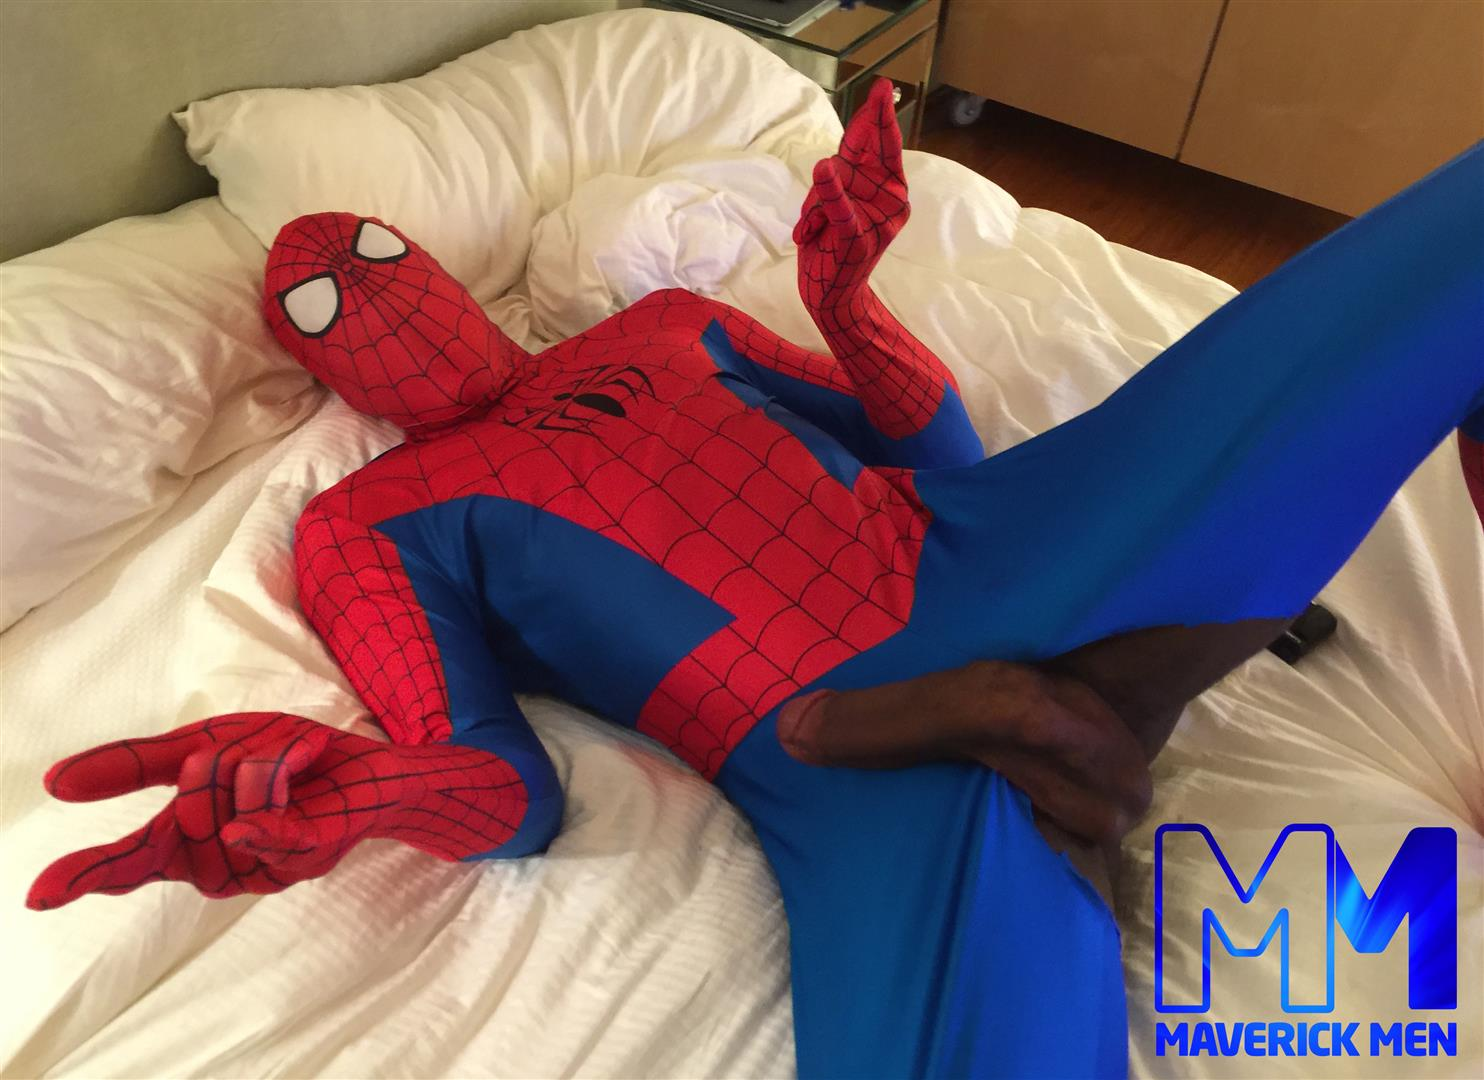 Maverick Men Spiderman With A Big Black Dick Bareback Threesome Amateur Gay Porn 01